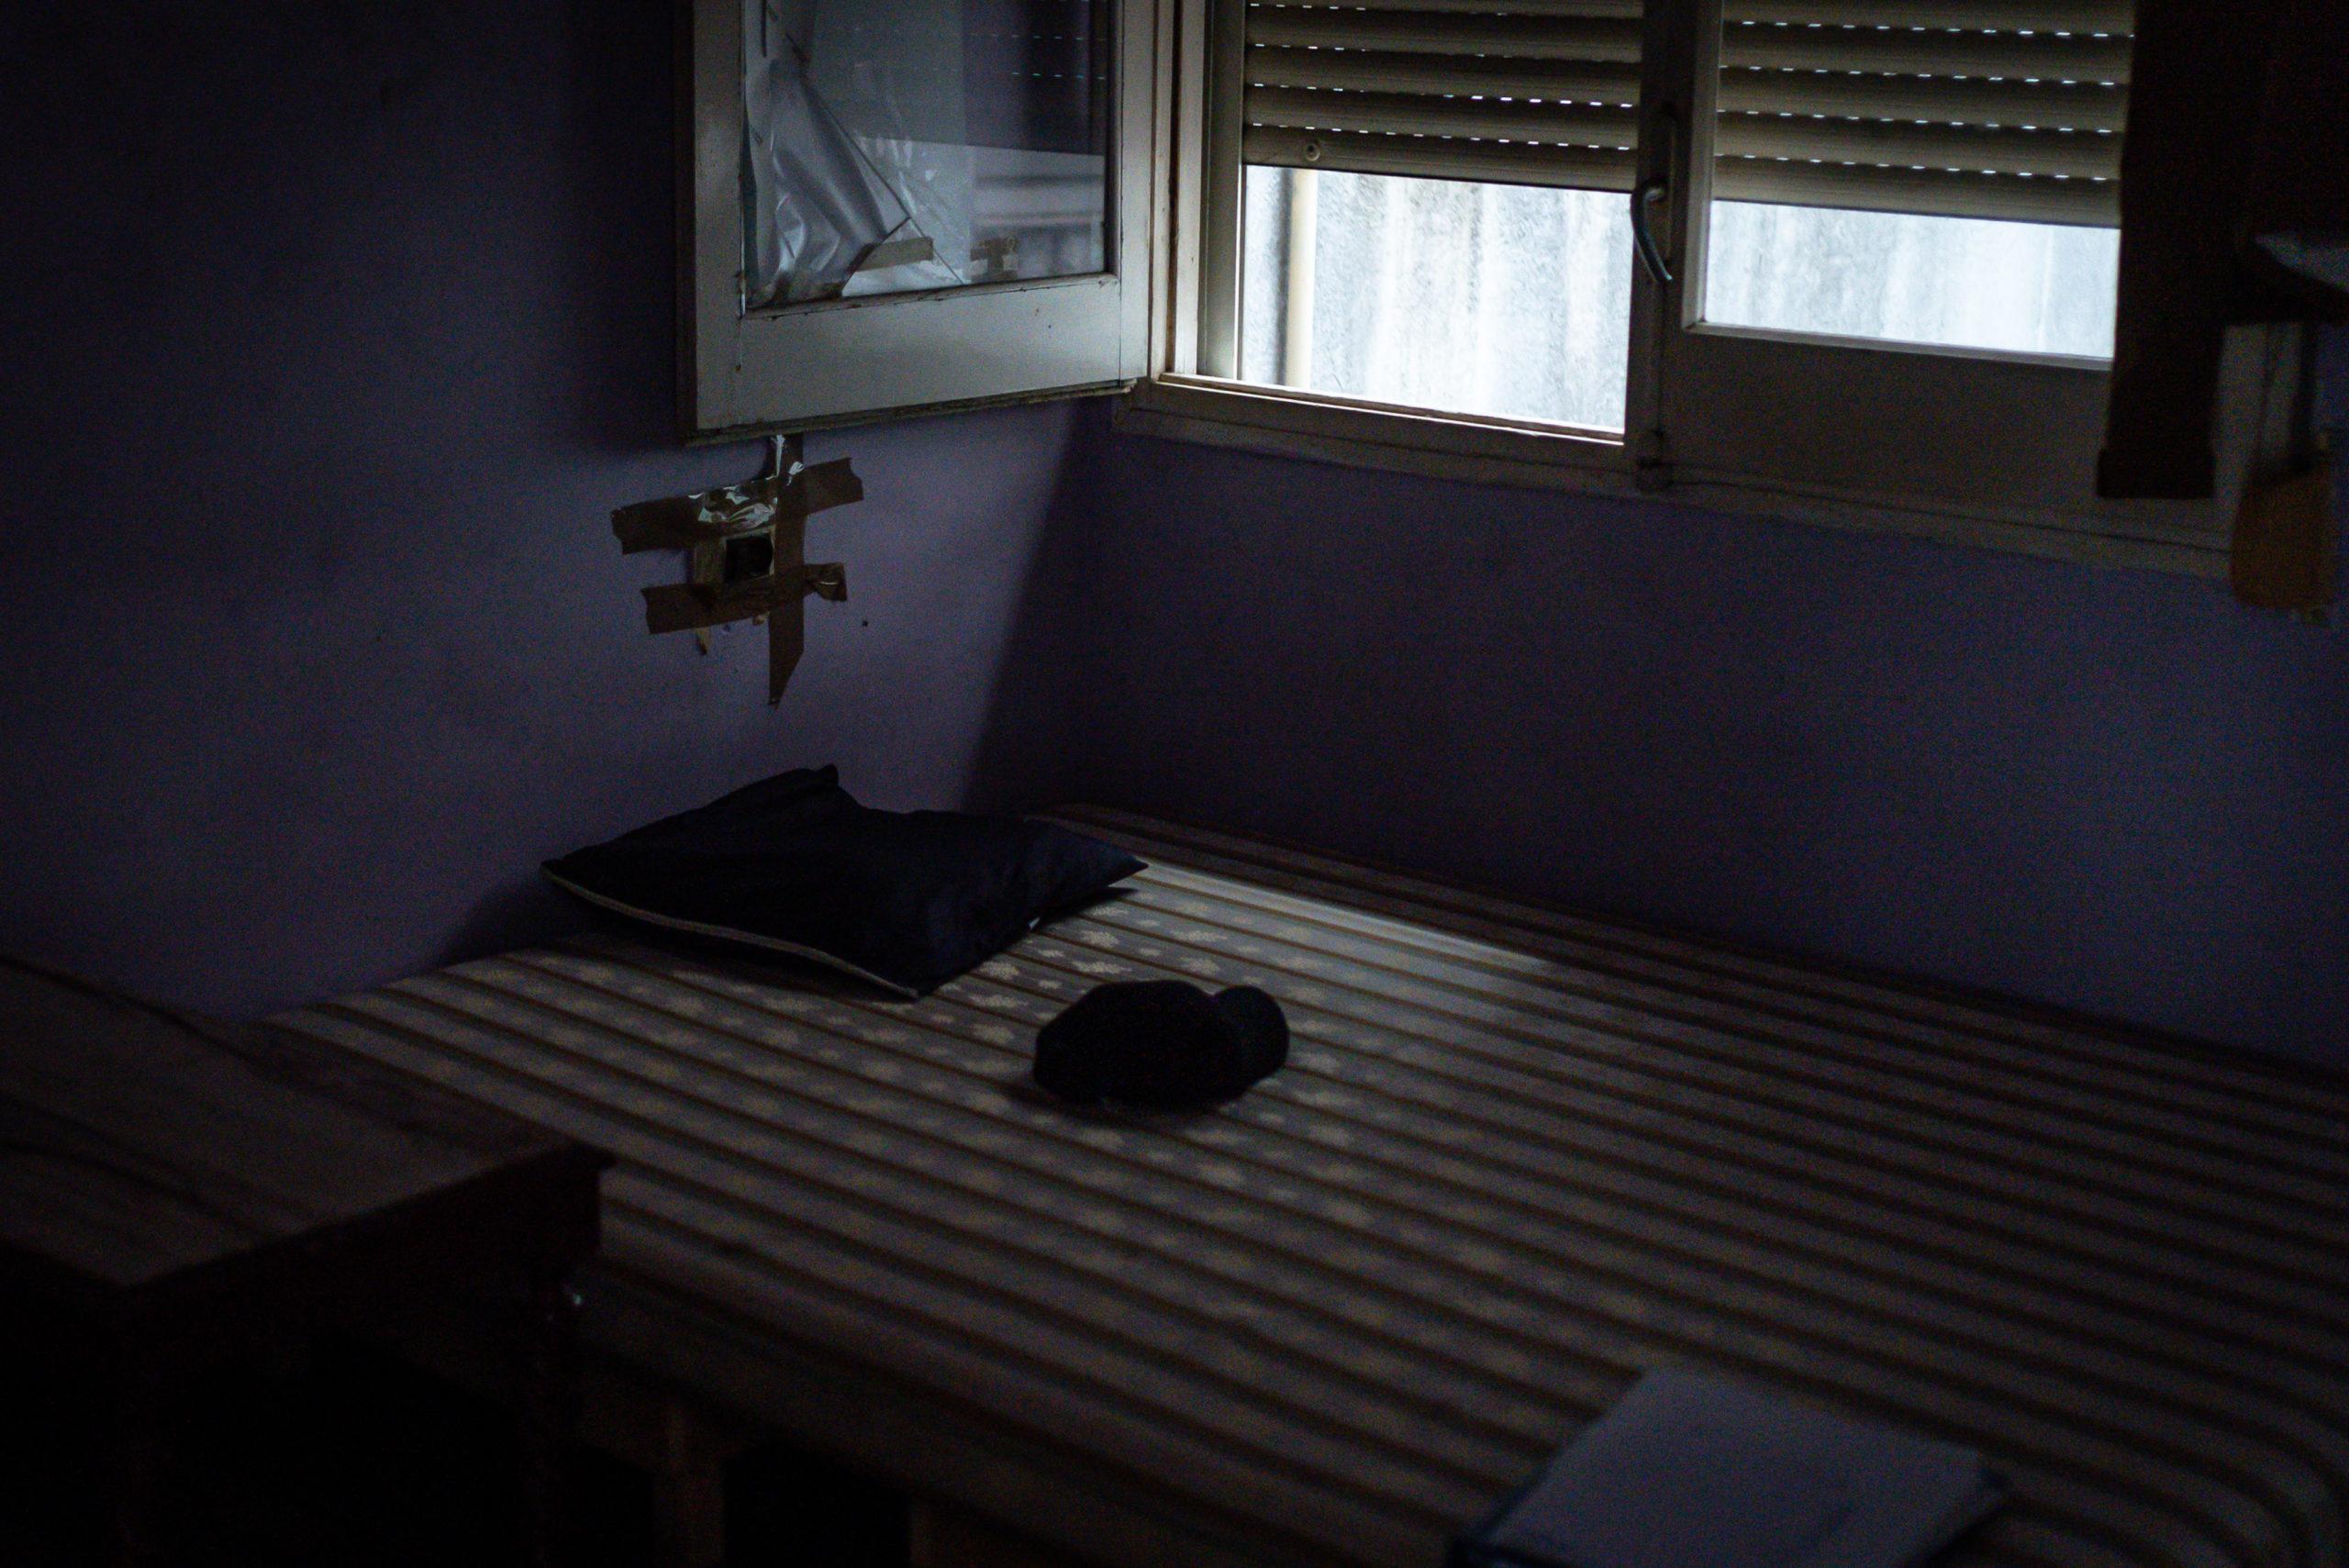 press,photo,photojournalism,photography,covid-19,coronavirus,epidemic,pandemic,crisis,spain,catalonia,eviction